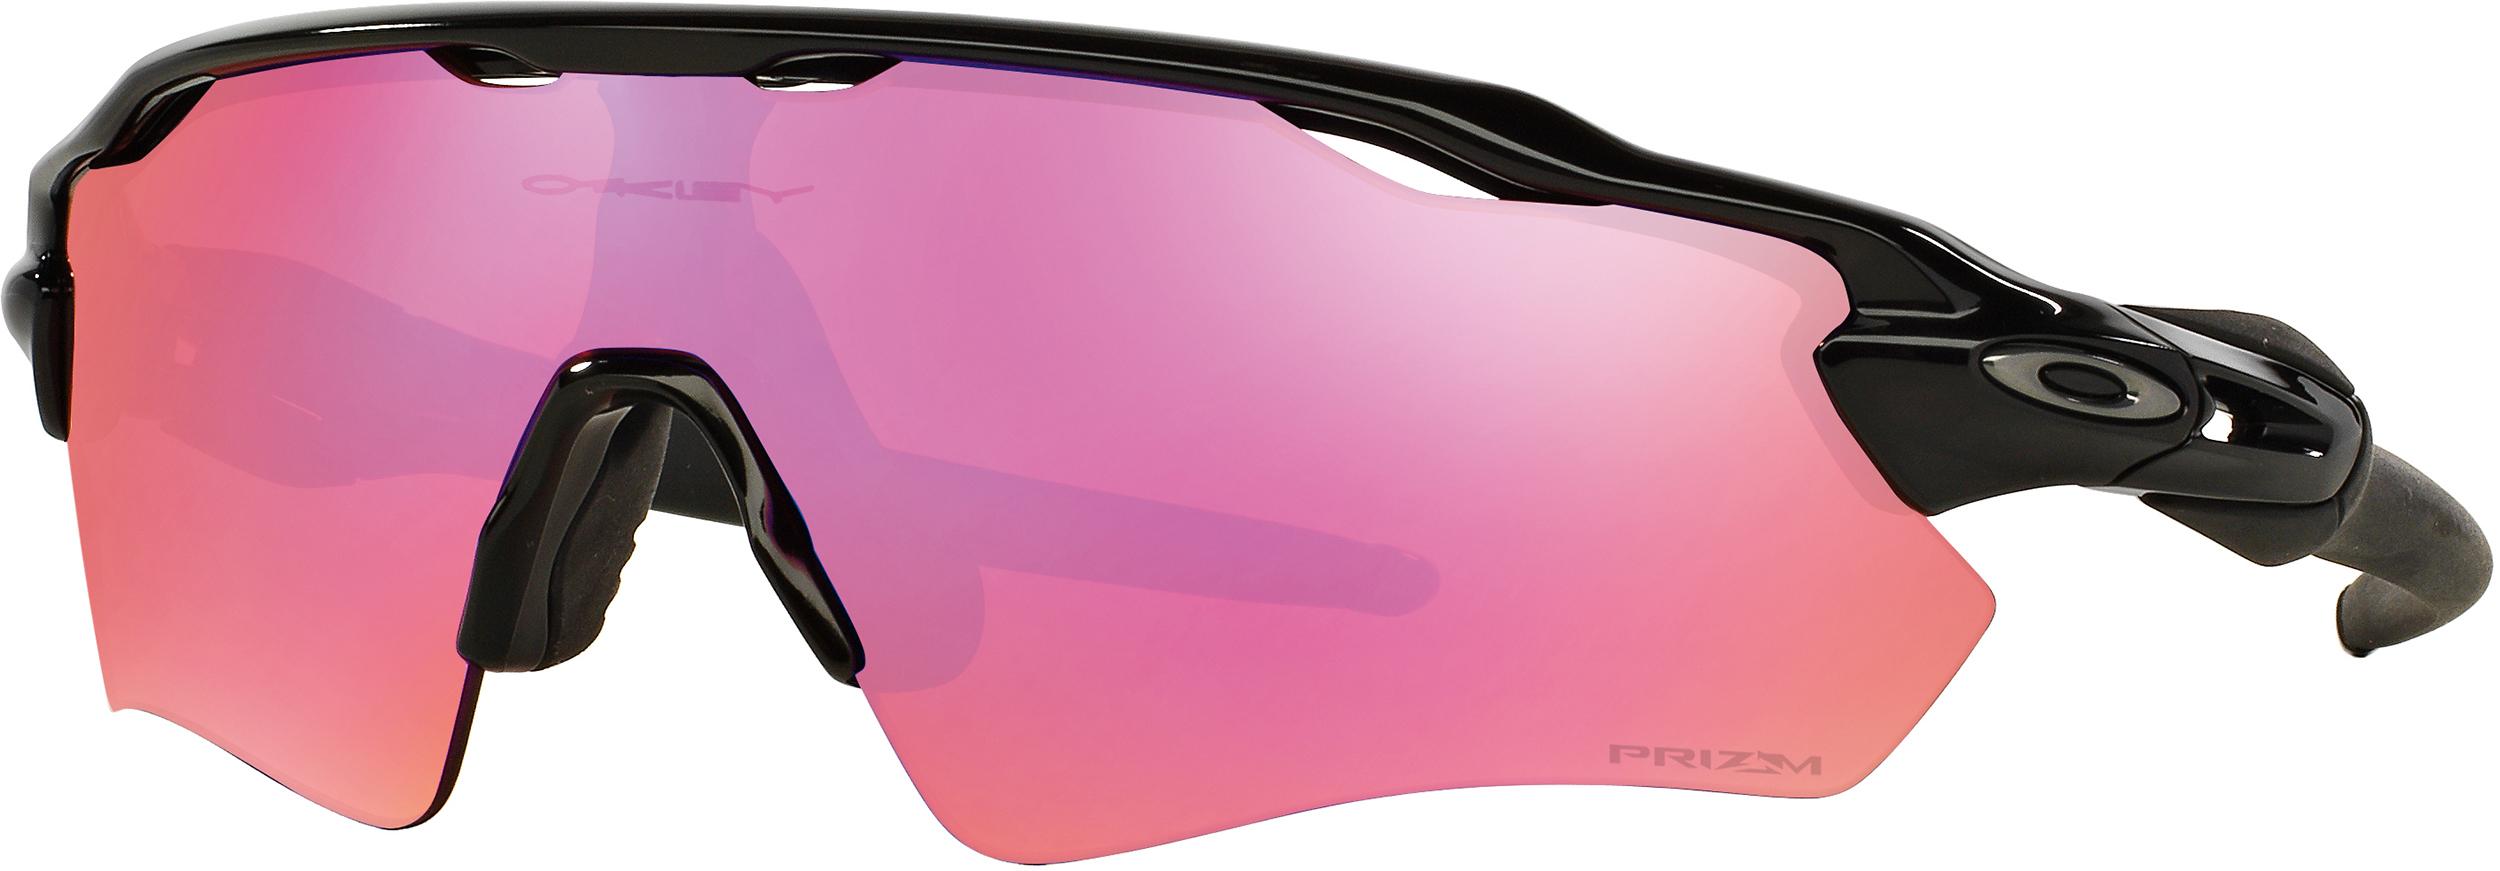 f5768228c0 Oakley Radar EV Path Sunglasses - Unisex | MEC